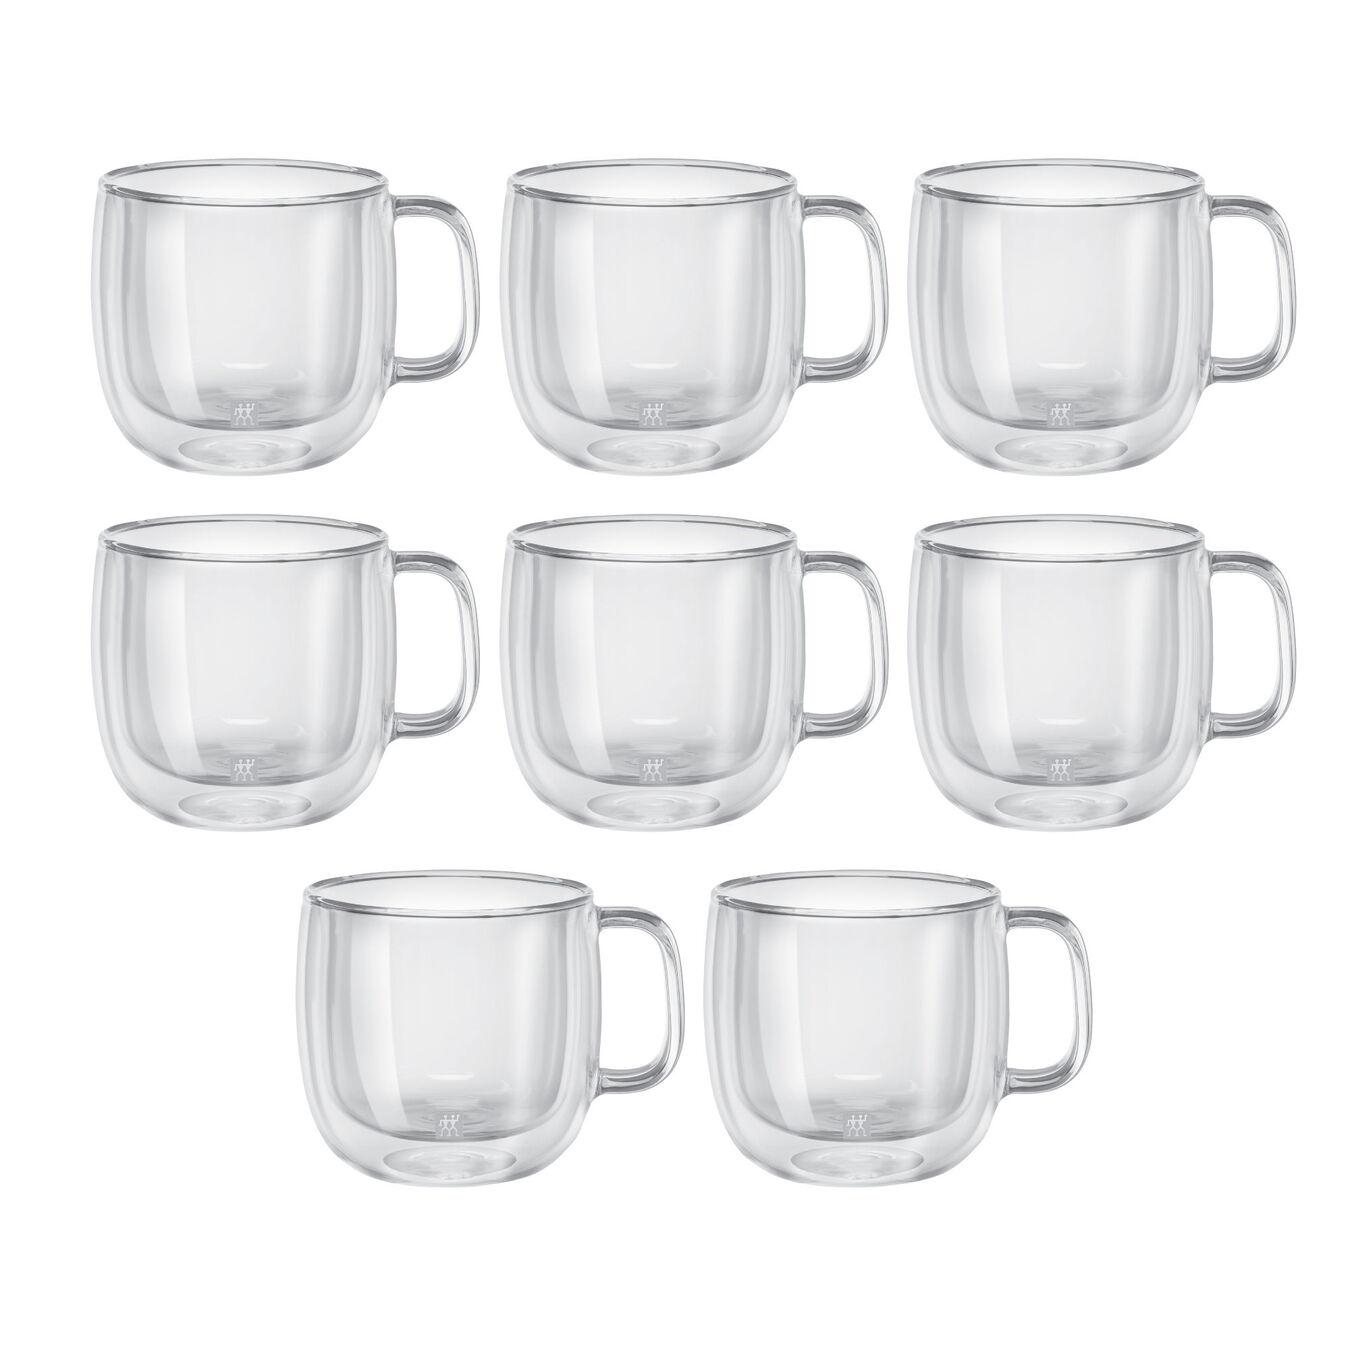 8 Piece Cappuccino Mug Set - Value Pack,,large 3